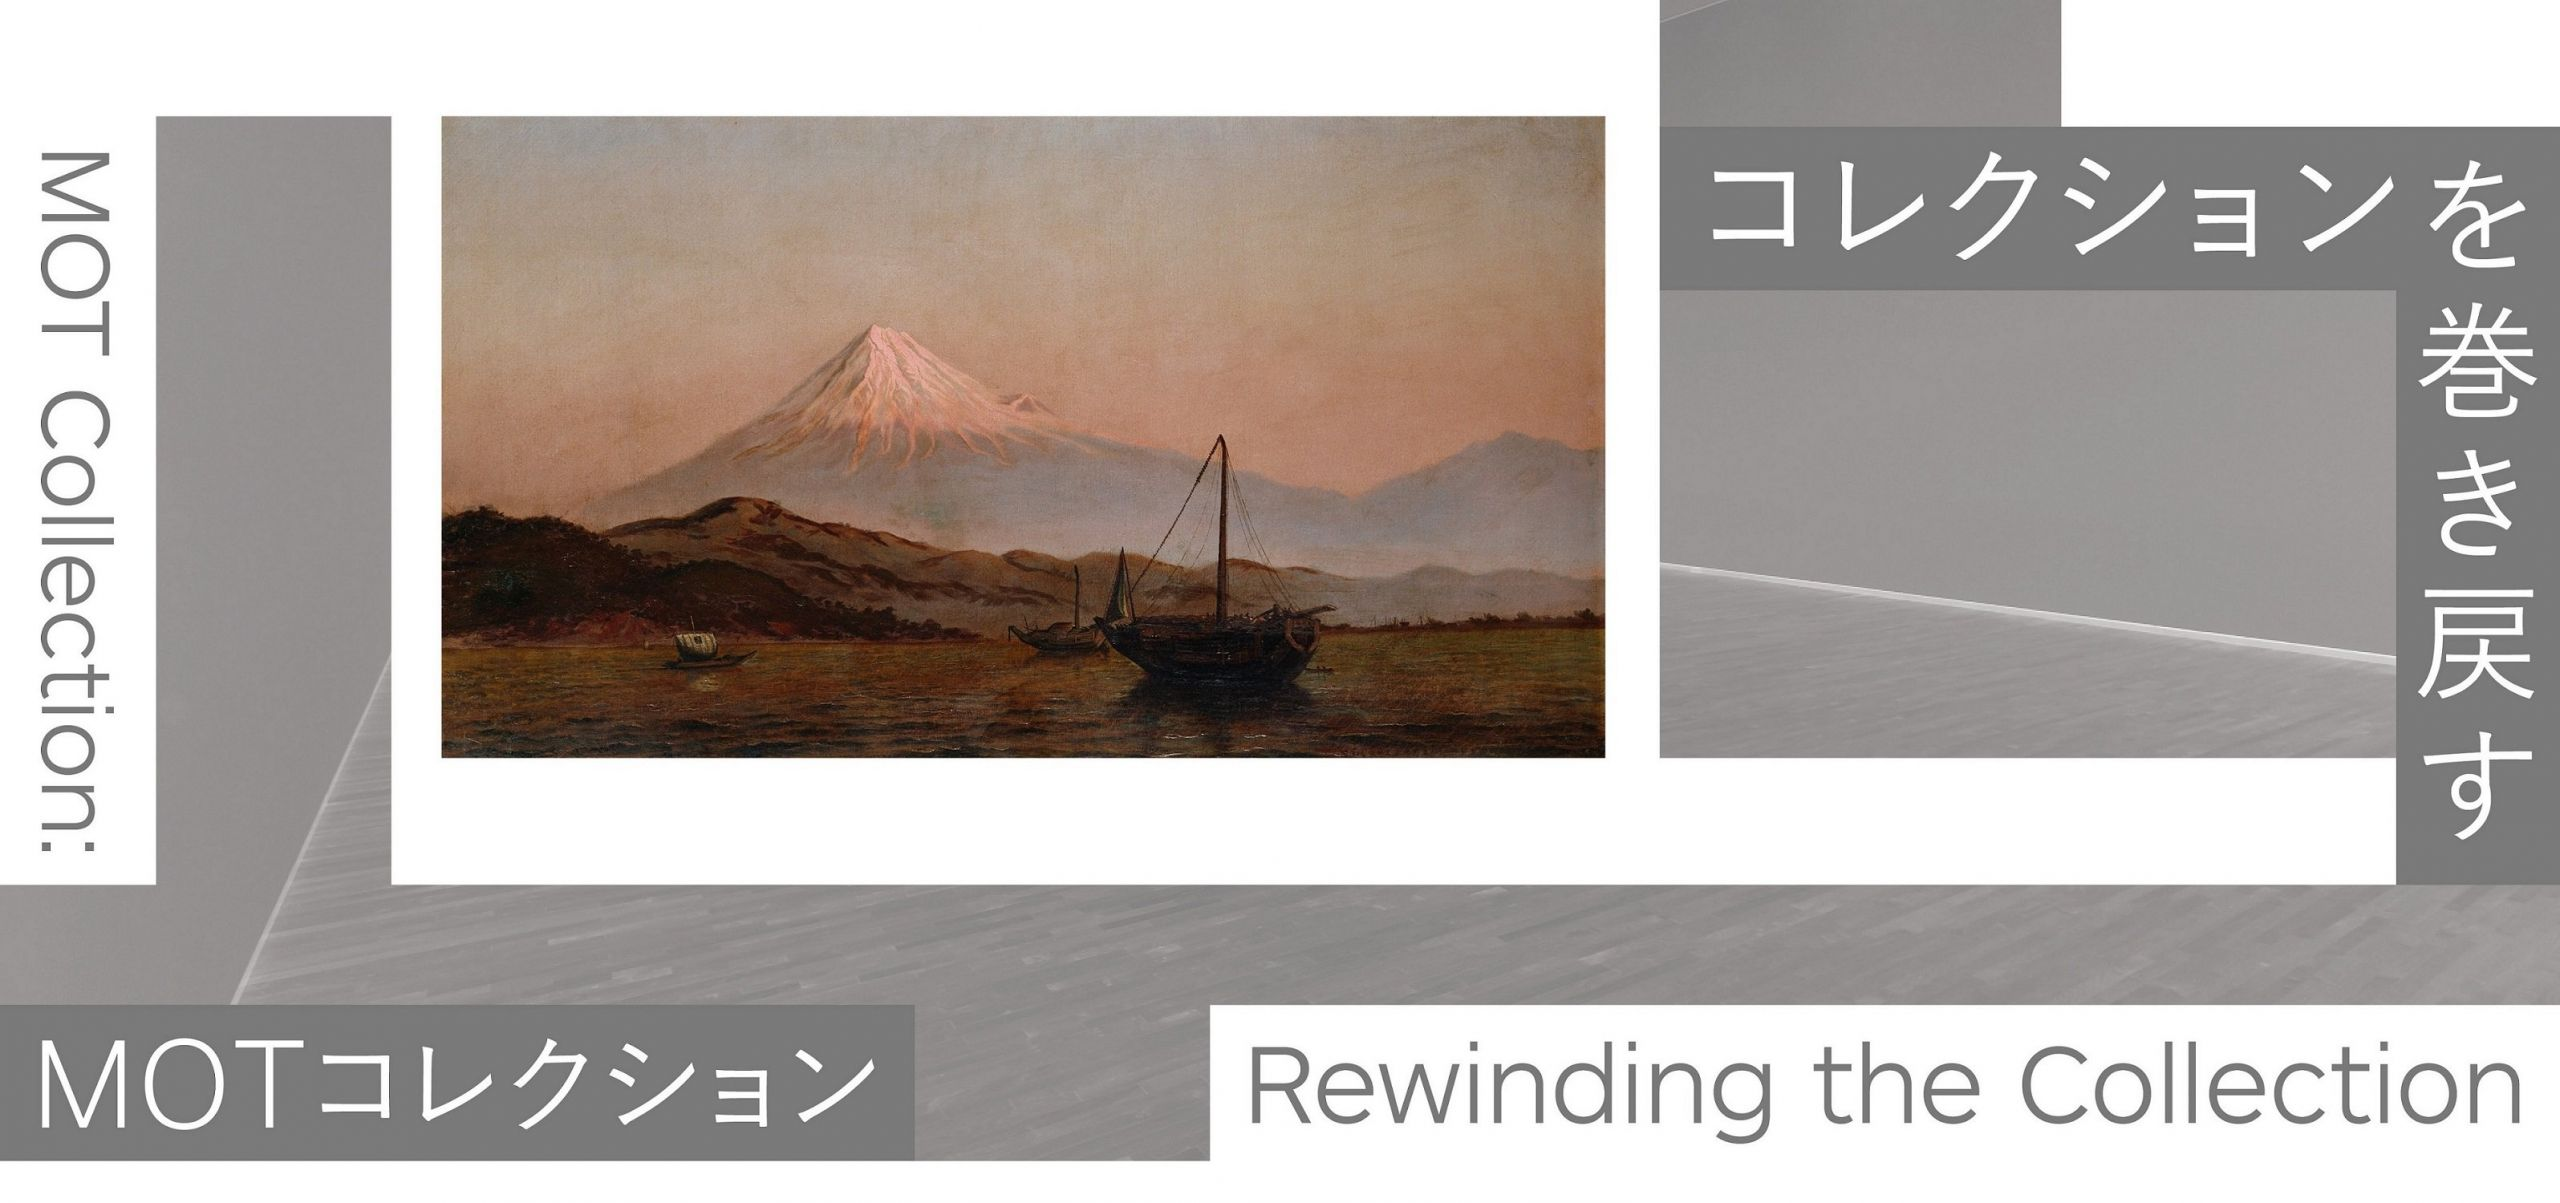 Museum of Contemporary Art Tokyo MOT Metropolis Magazine